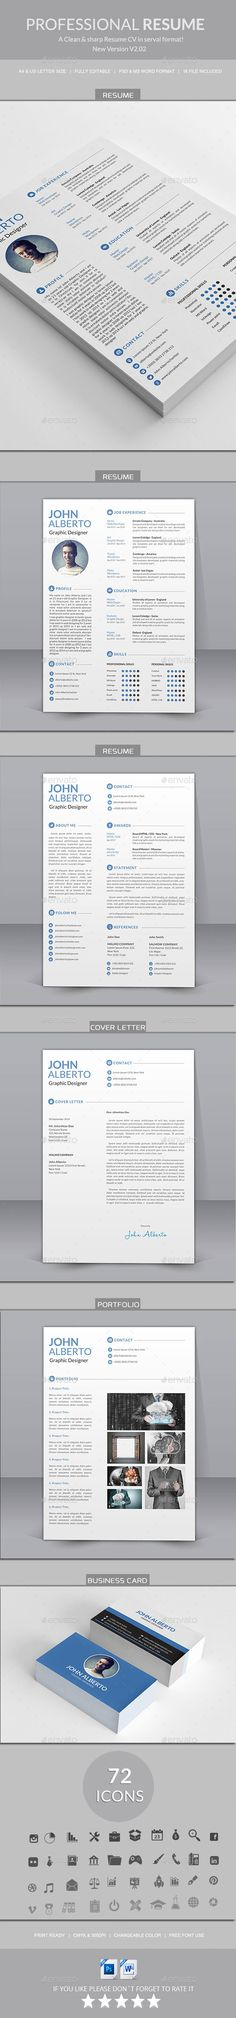 Resume / CV Creative, Template and Creative resume - cv vs resume